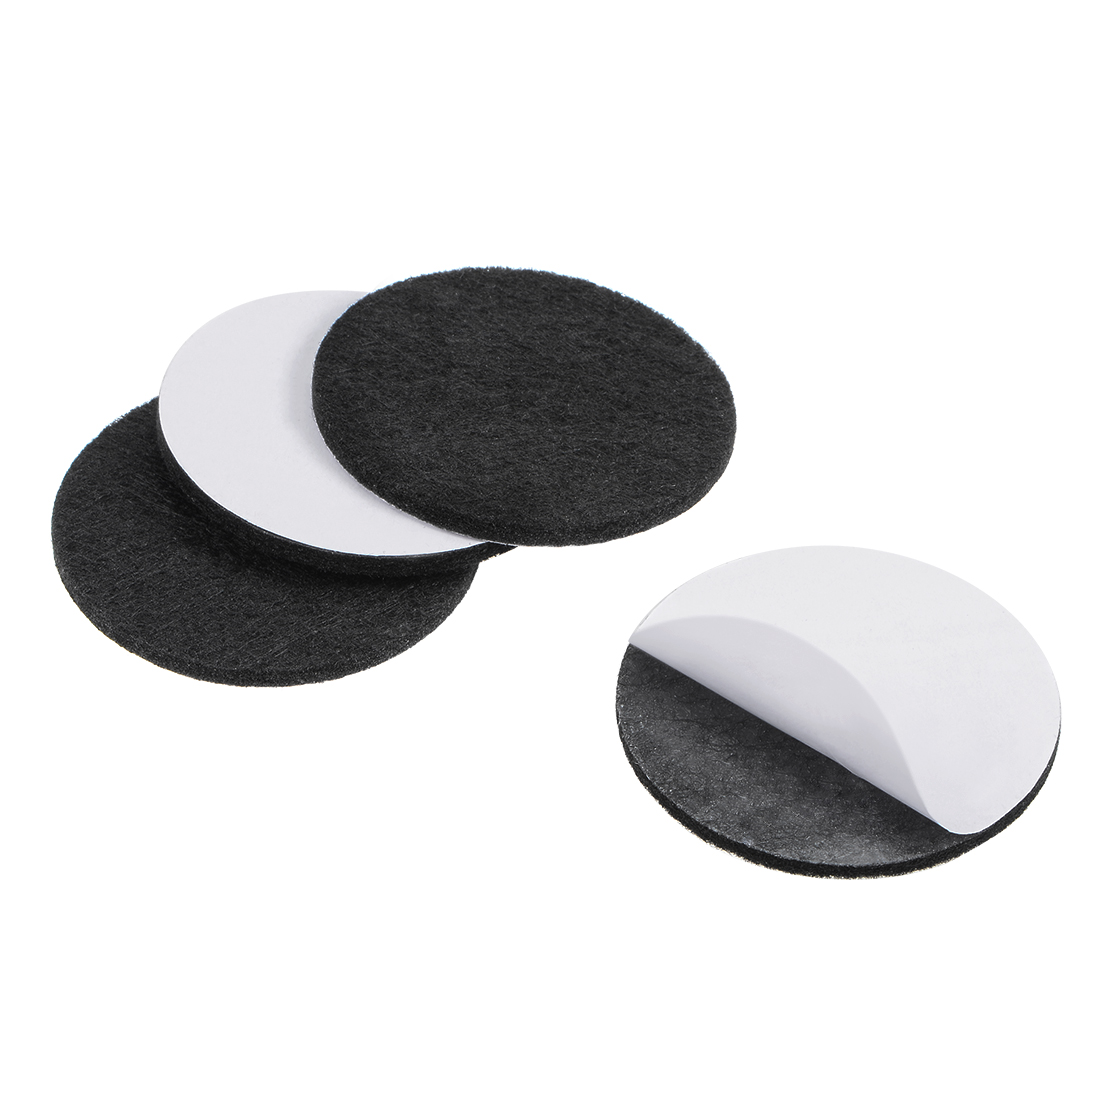 Furniture Pads Adhesive Felt Pads 50mm Diameter 3mm Thick Round Black 4Pcs